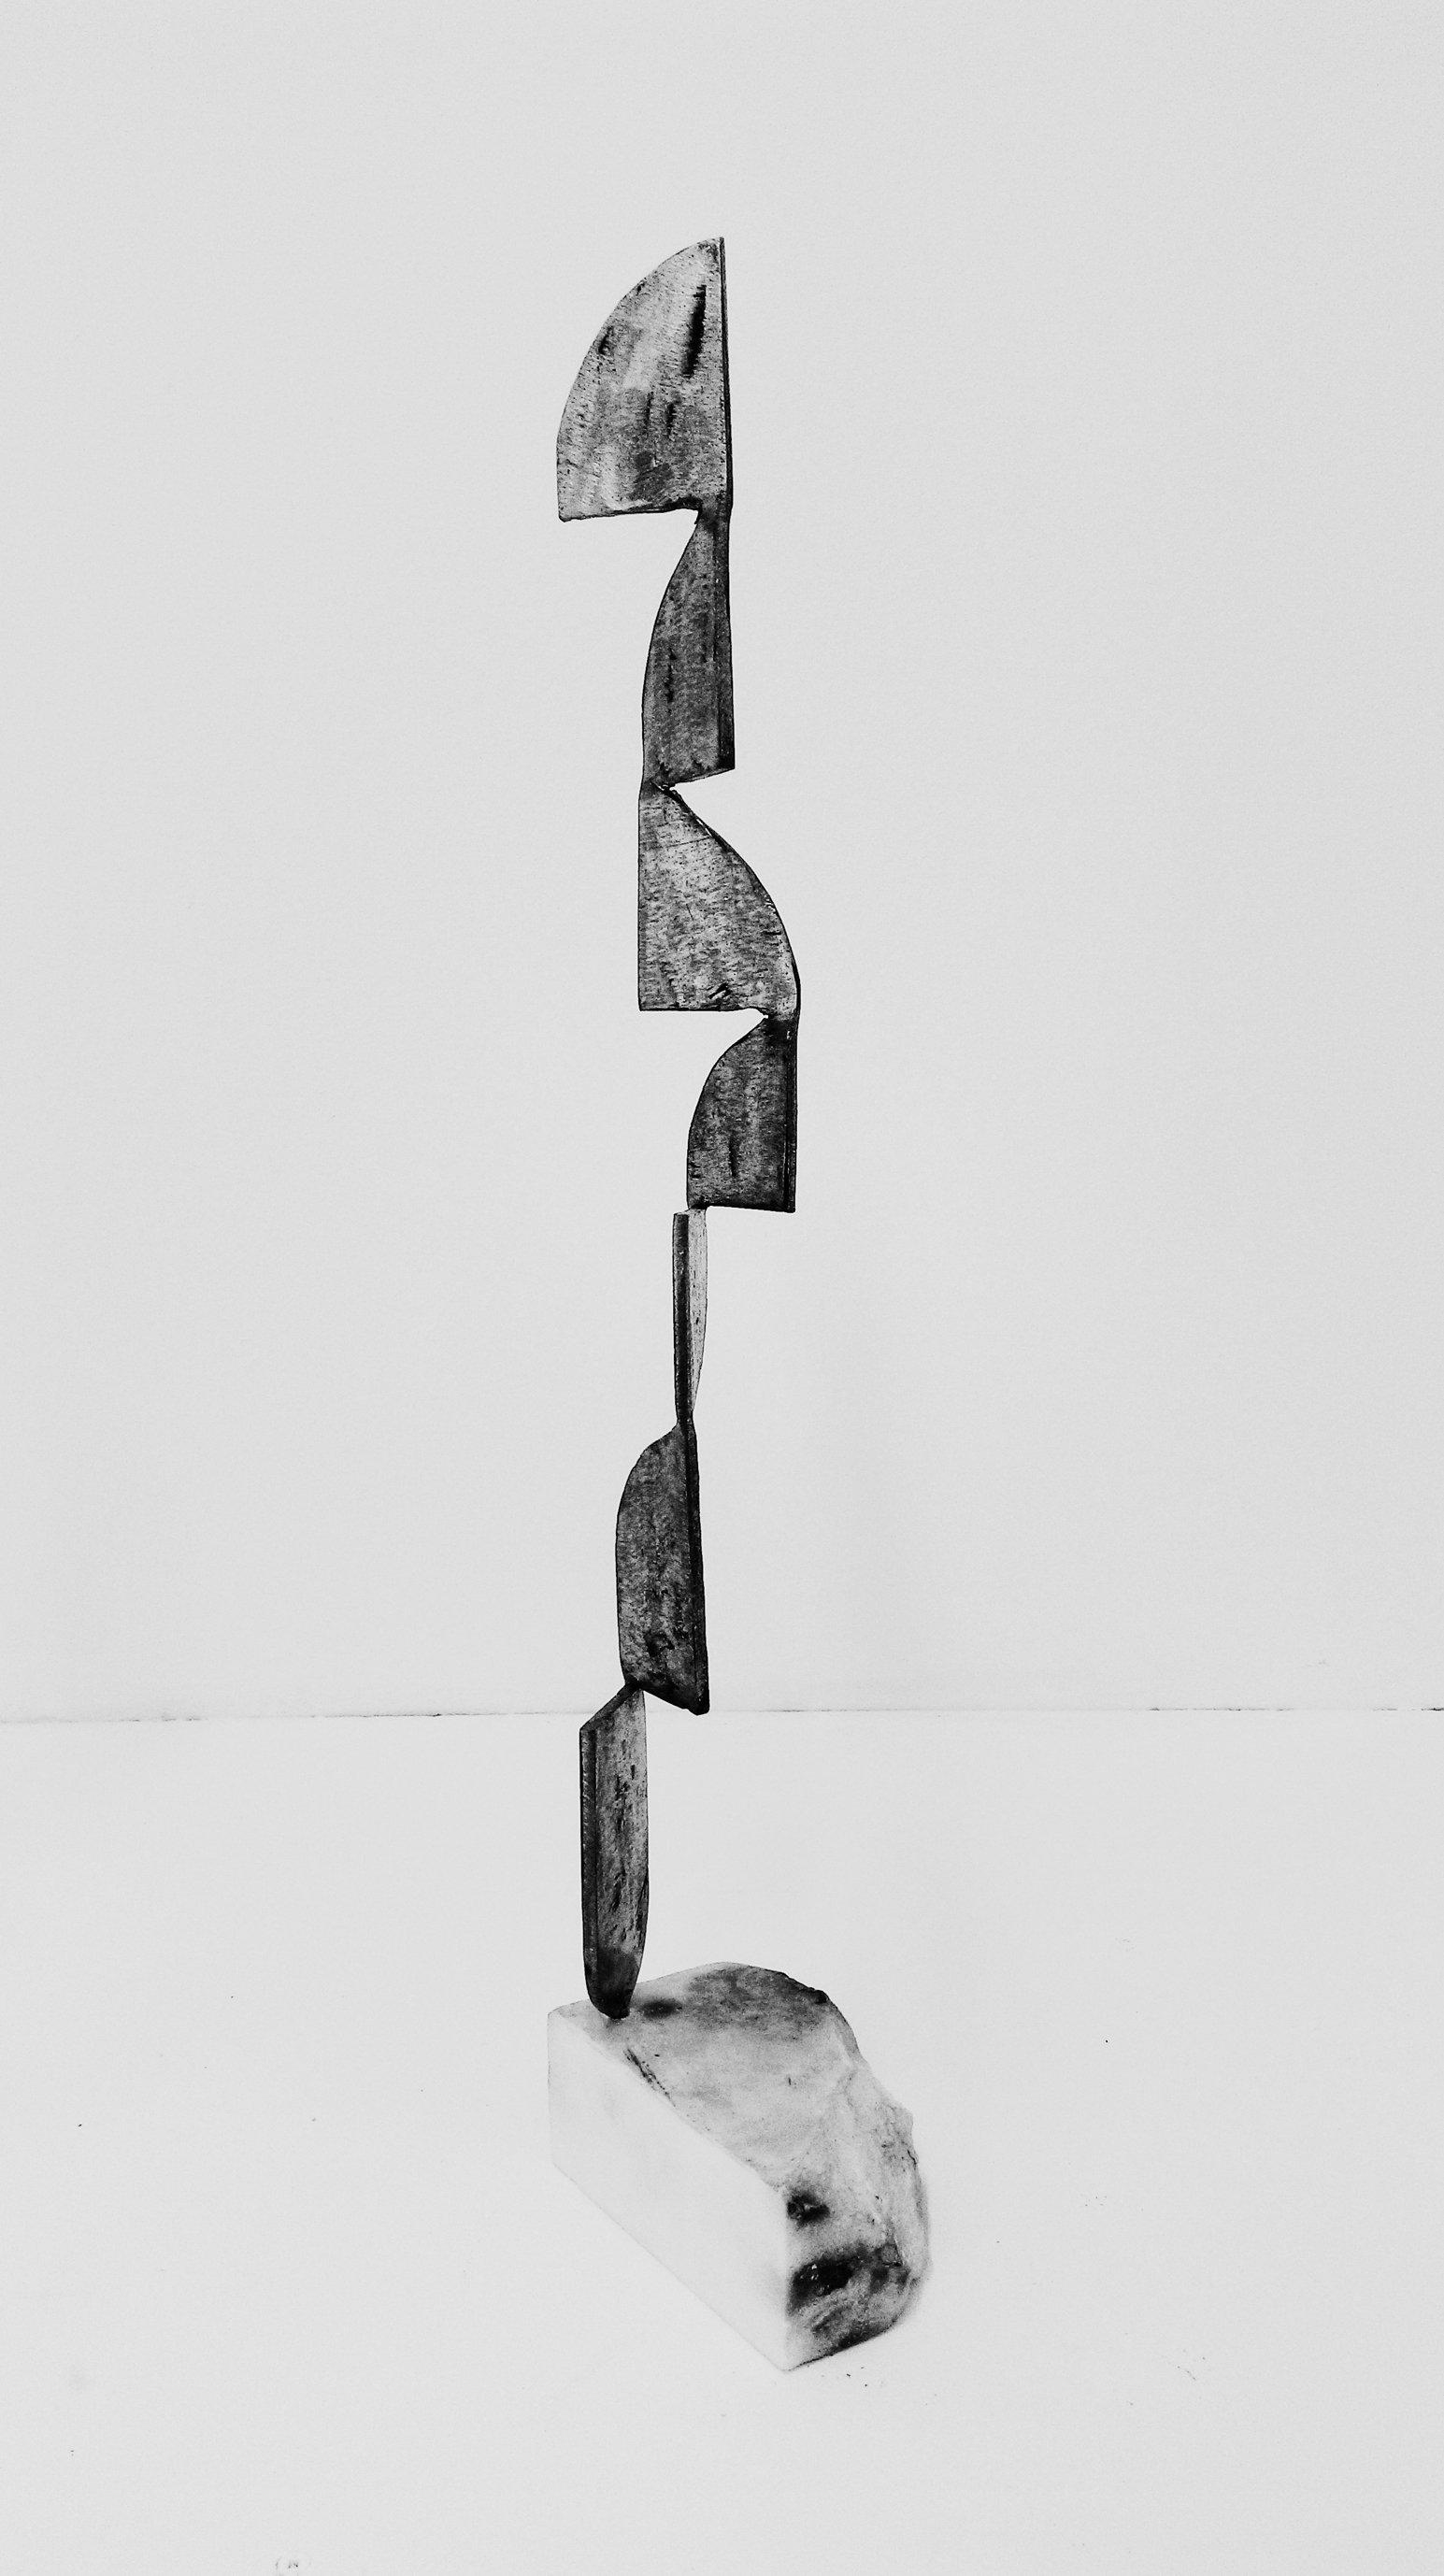 how to buy sculpture online, Greece, Bitcoin, Cnn, shop online